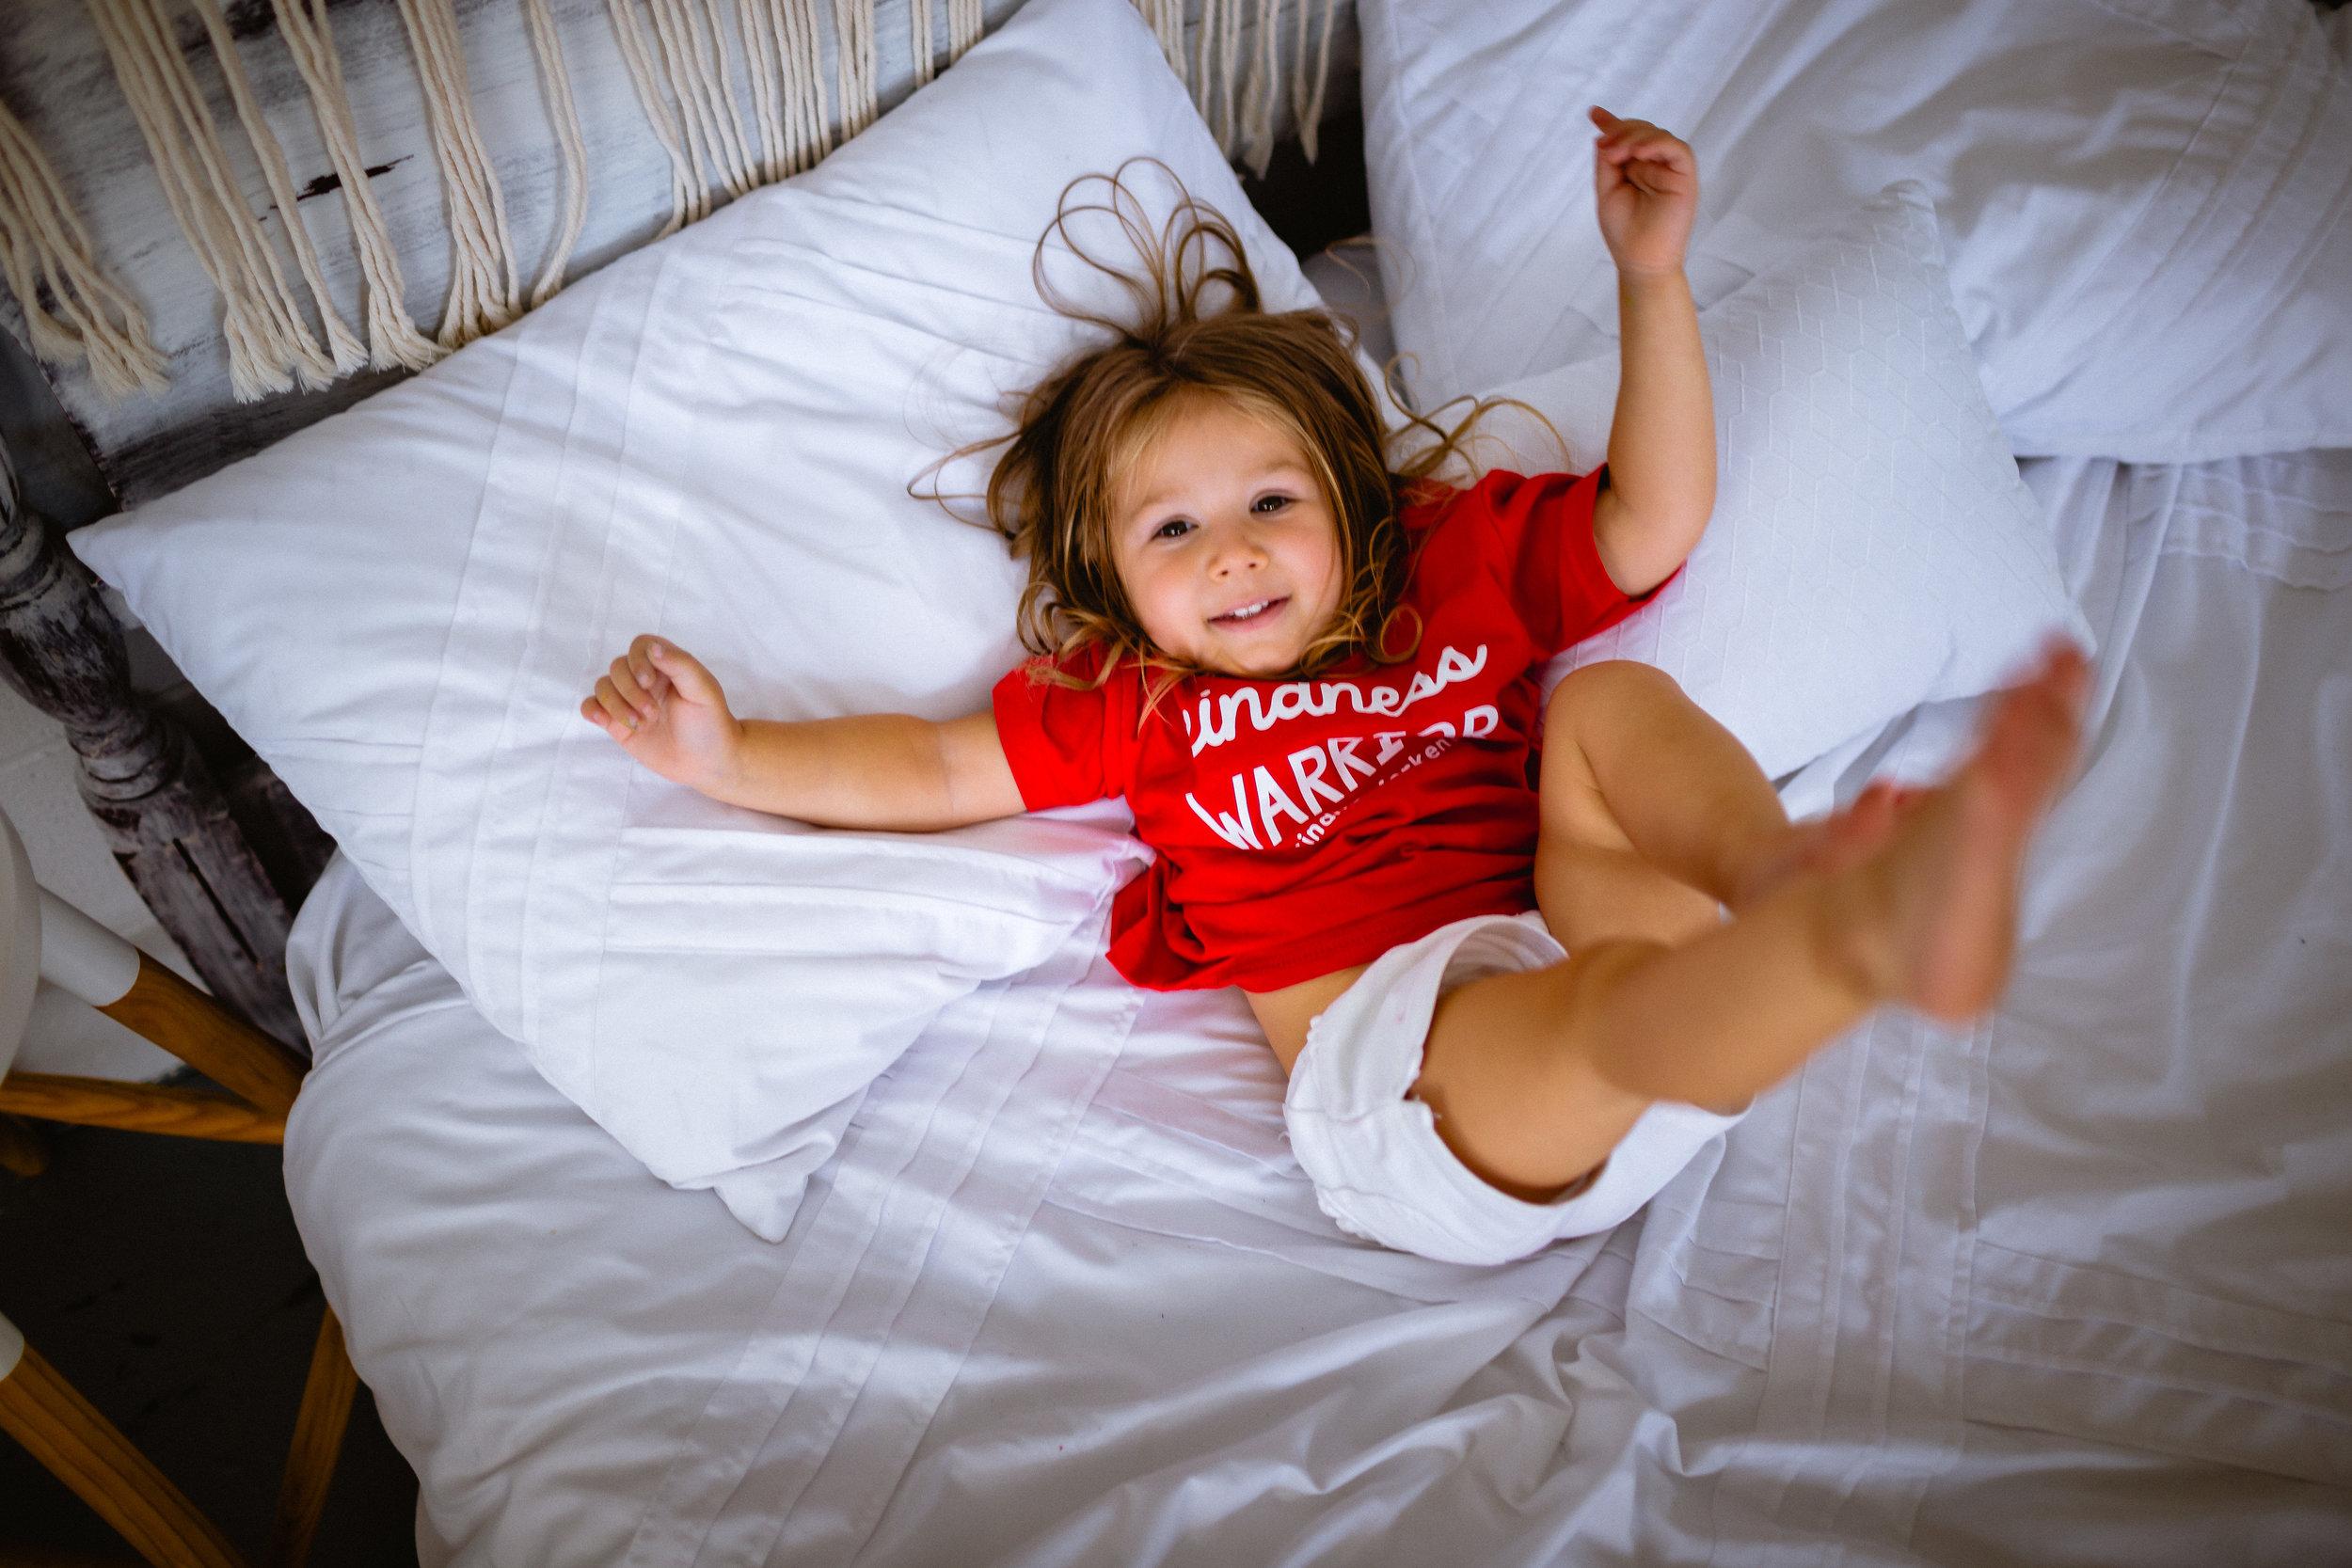 child on bed posing studio photographer